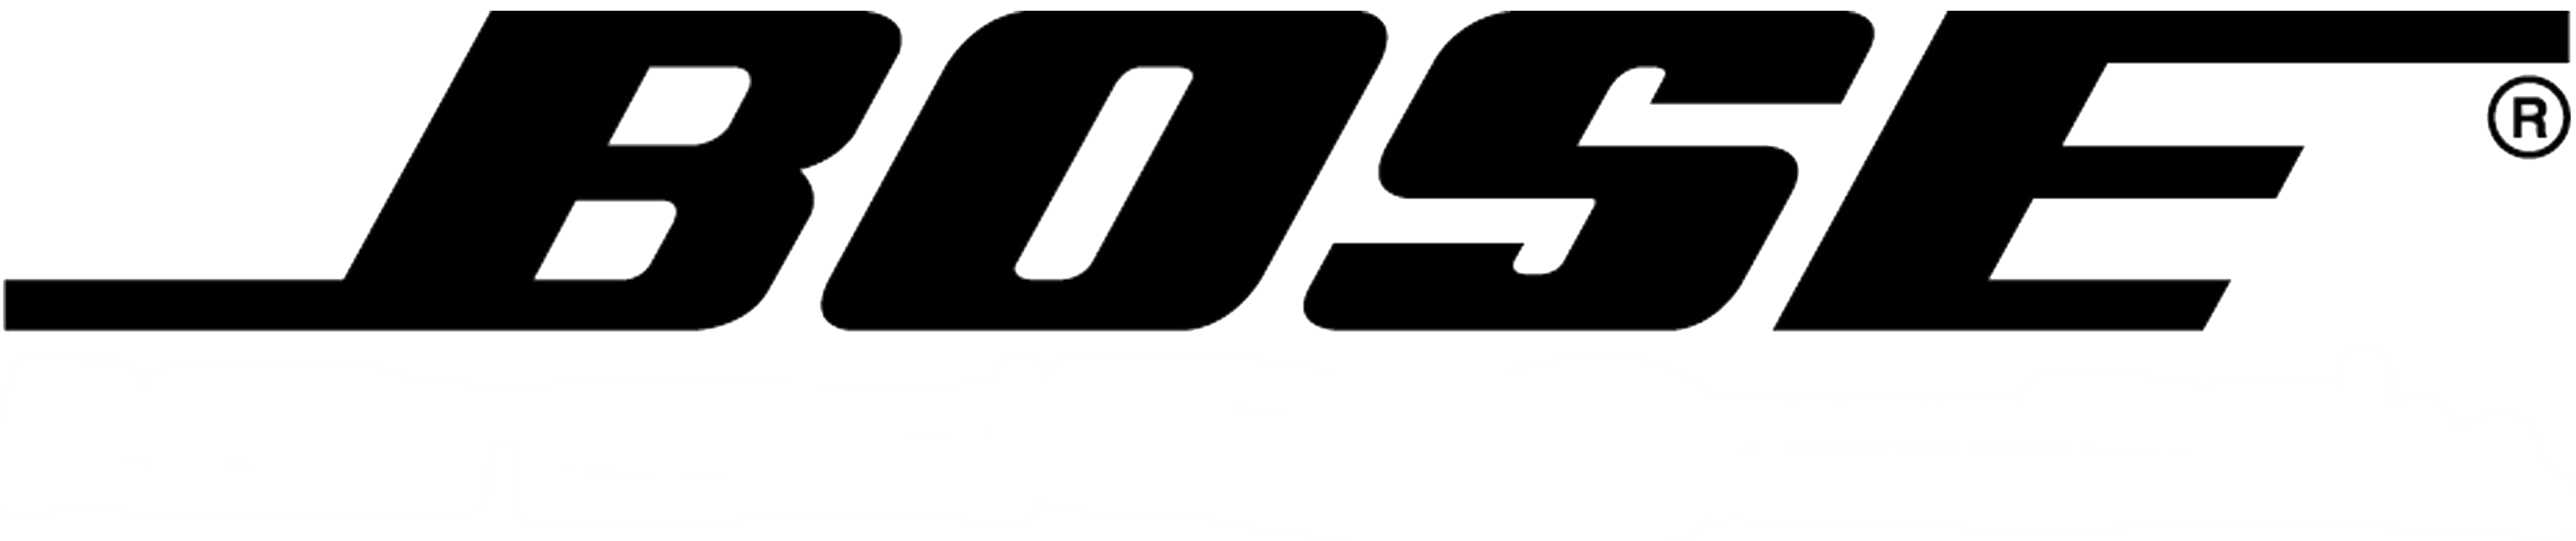 best-bose-logo